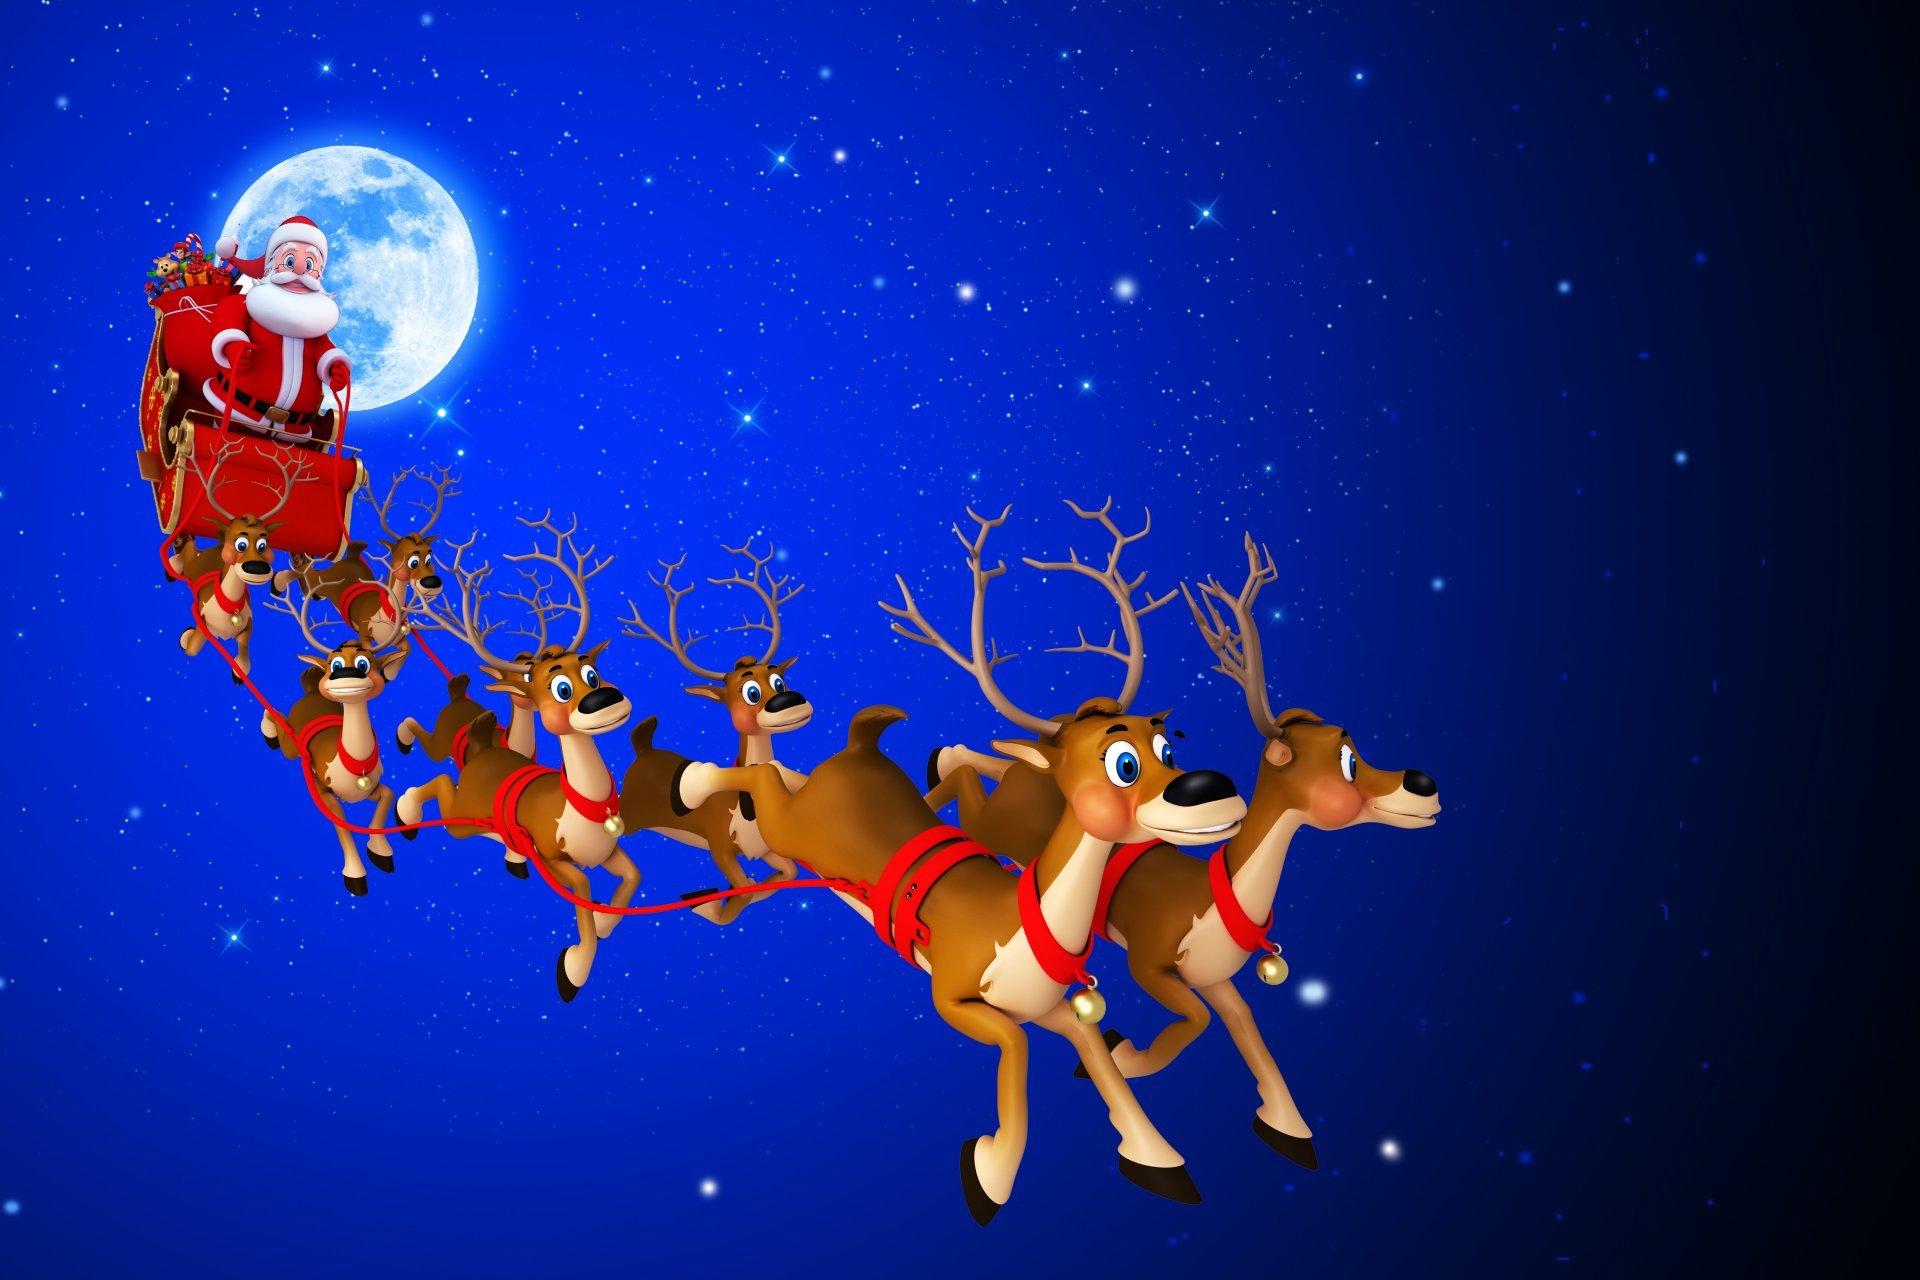 29 Santa S Sleigh In The Sky Wallpapers On Wallpapersafari